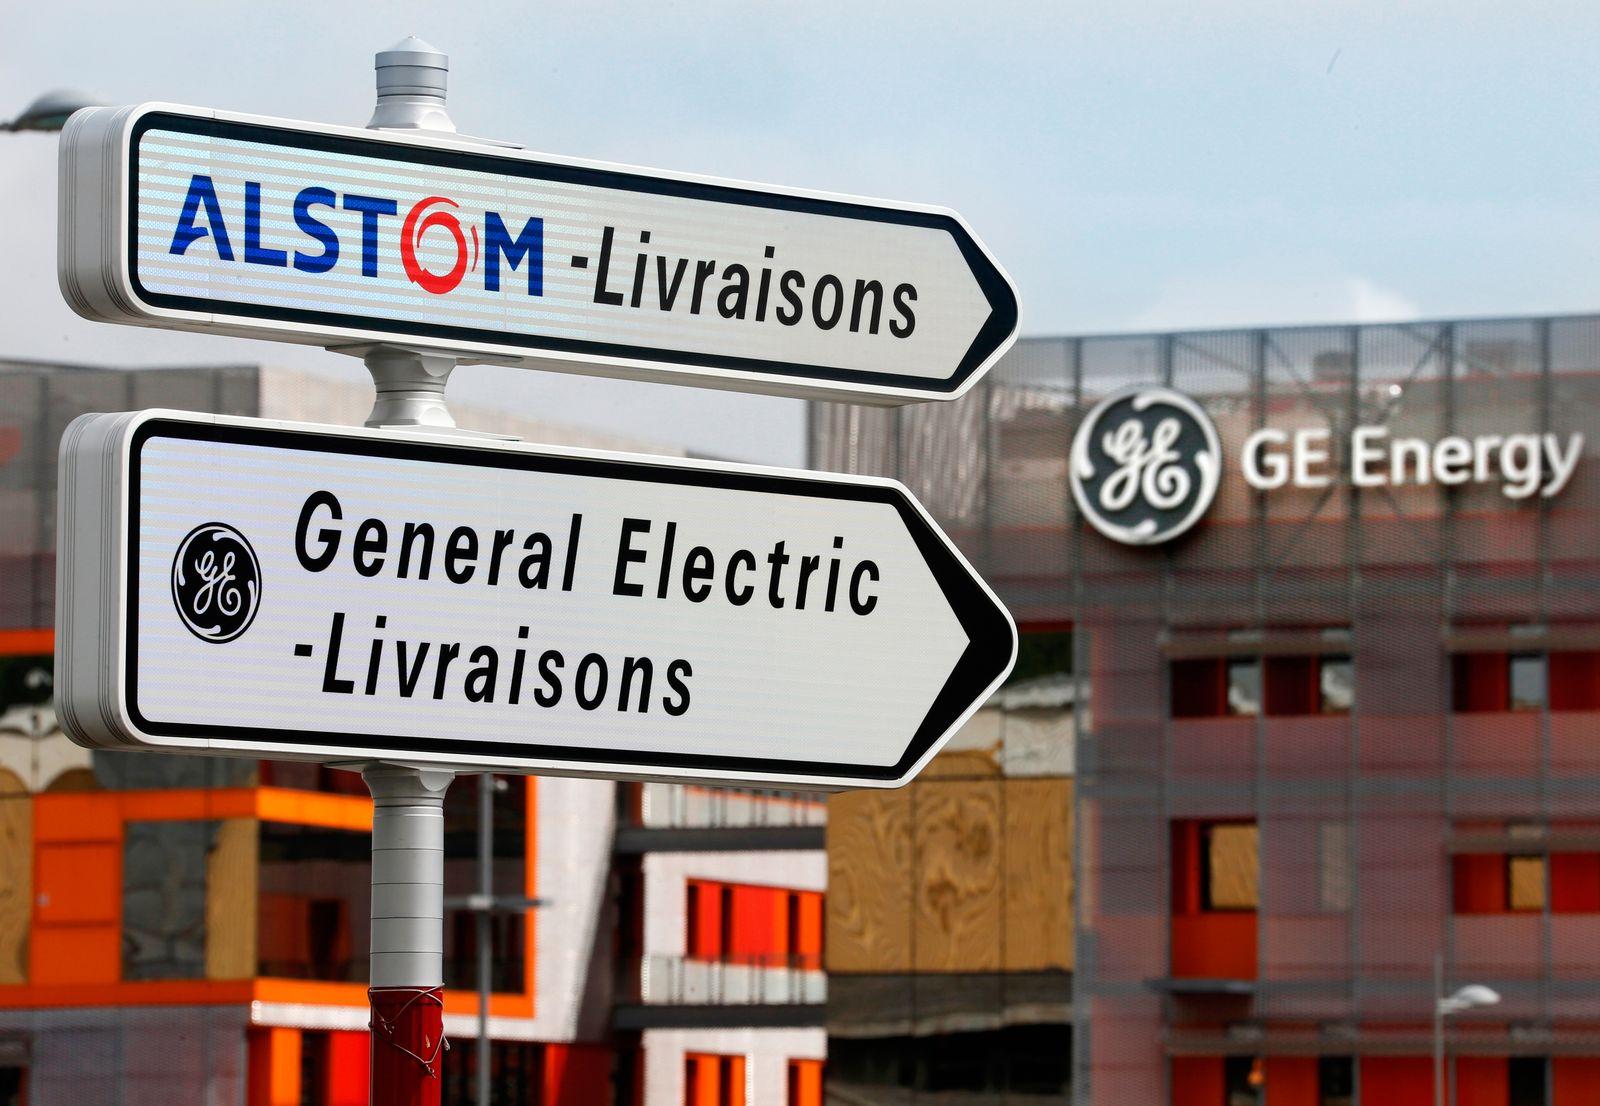 ALSTOM / GE / General Electric